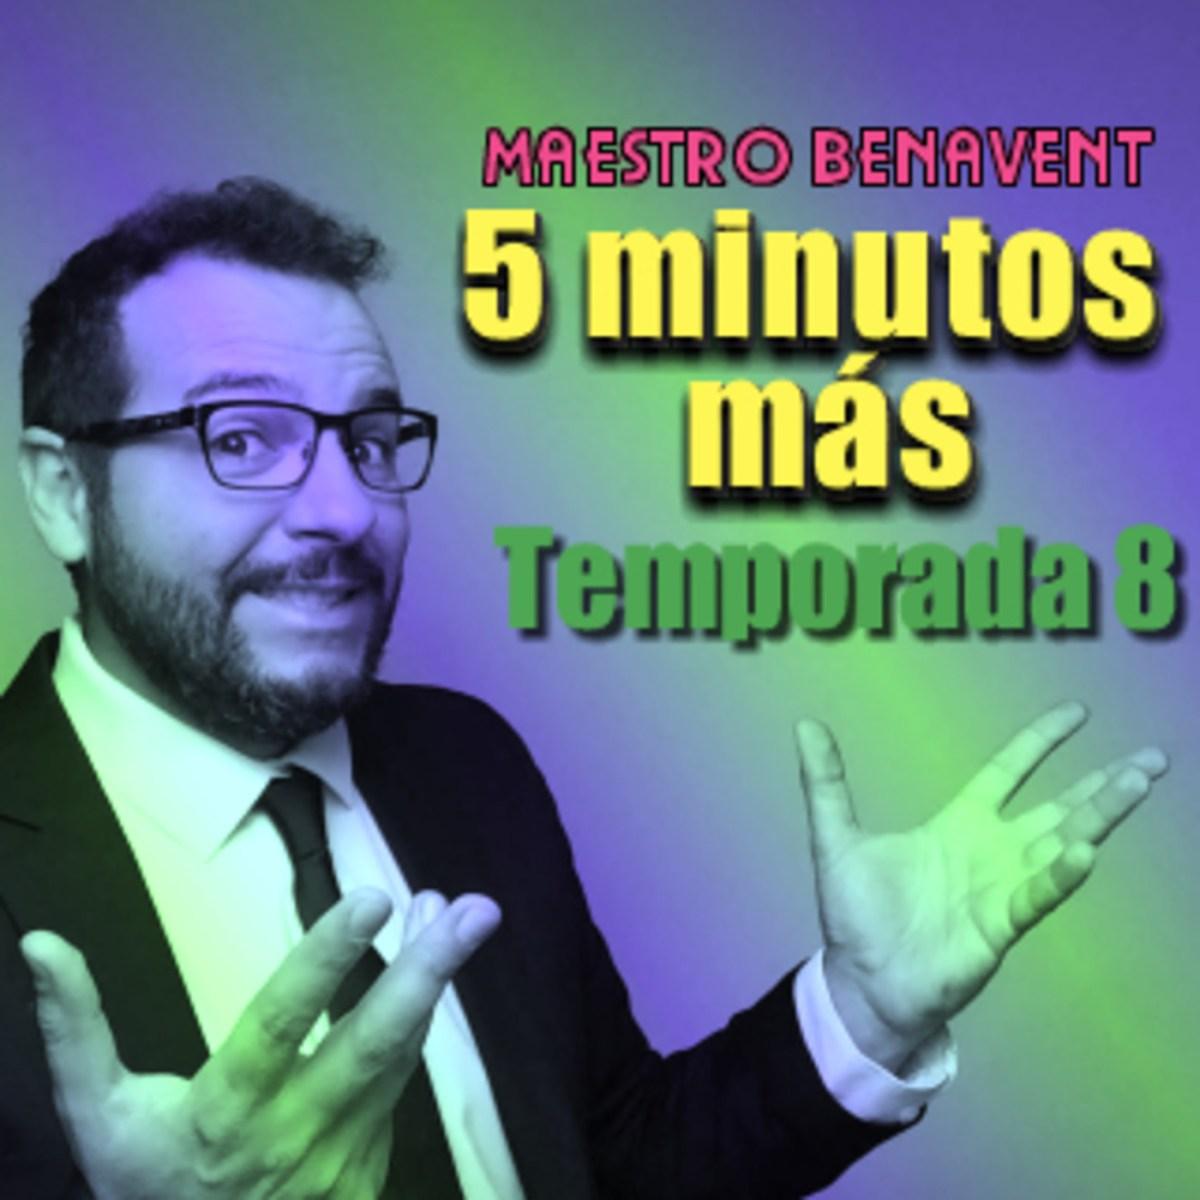 5 minutos mas